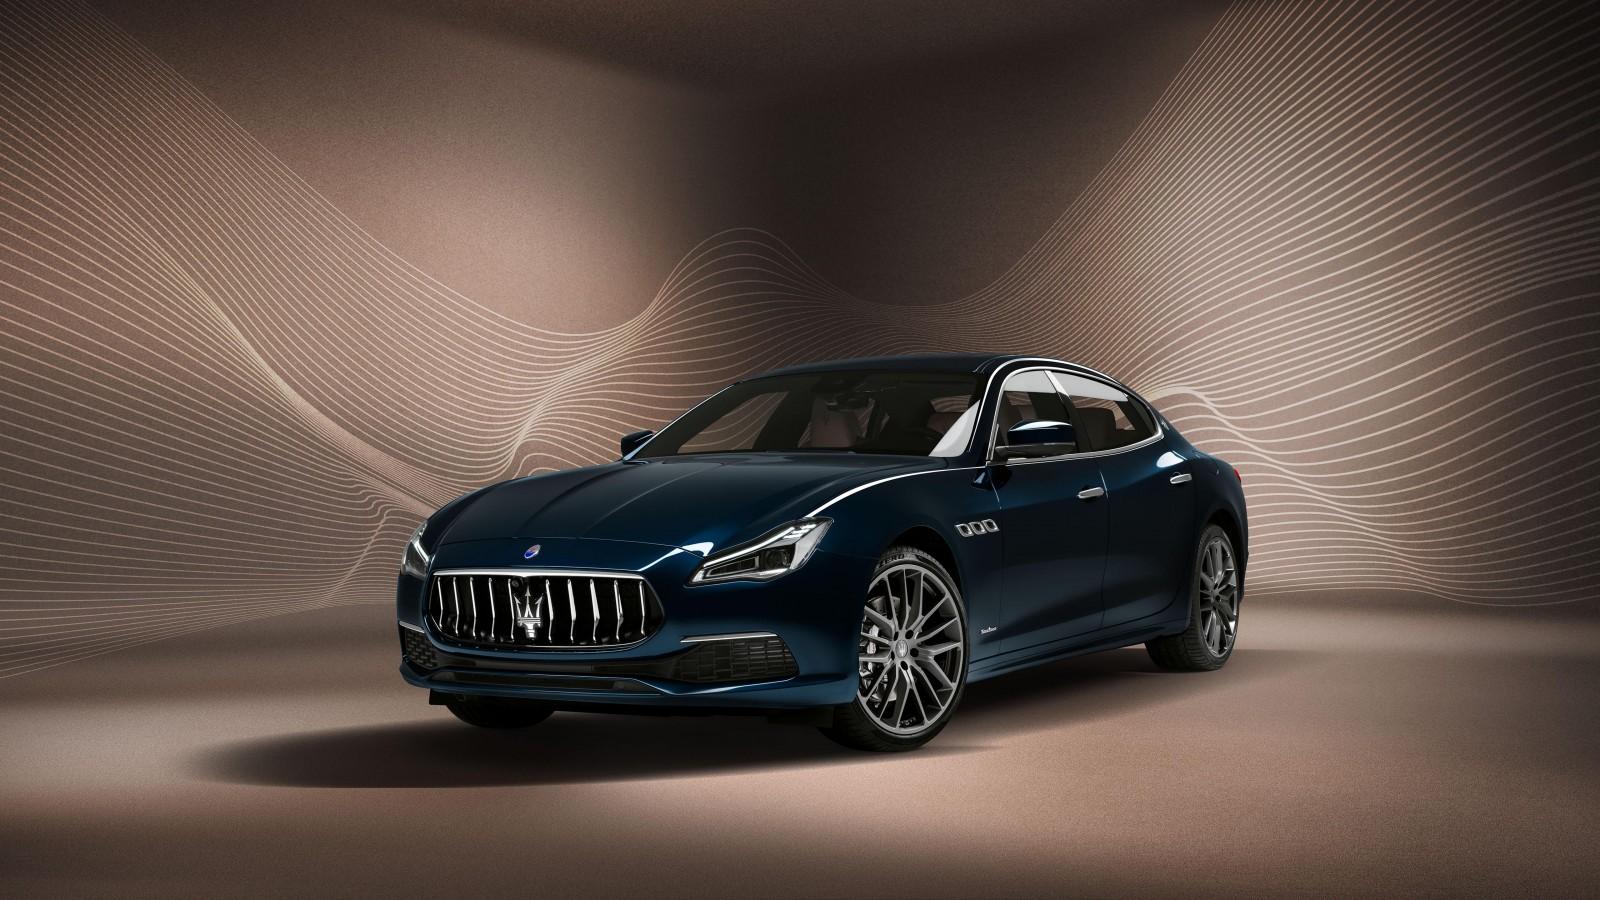 Maserati Quattroporte GranLusso Royale 2020 5K HD desktop 1600x900